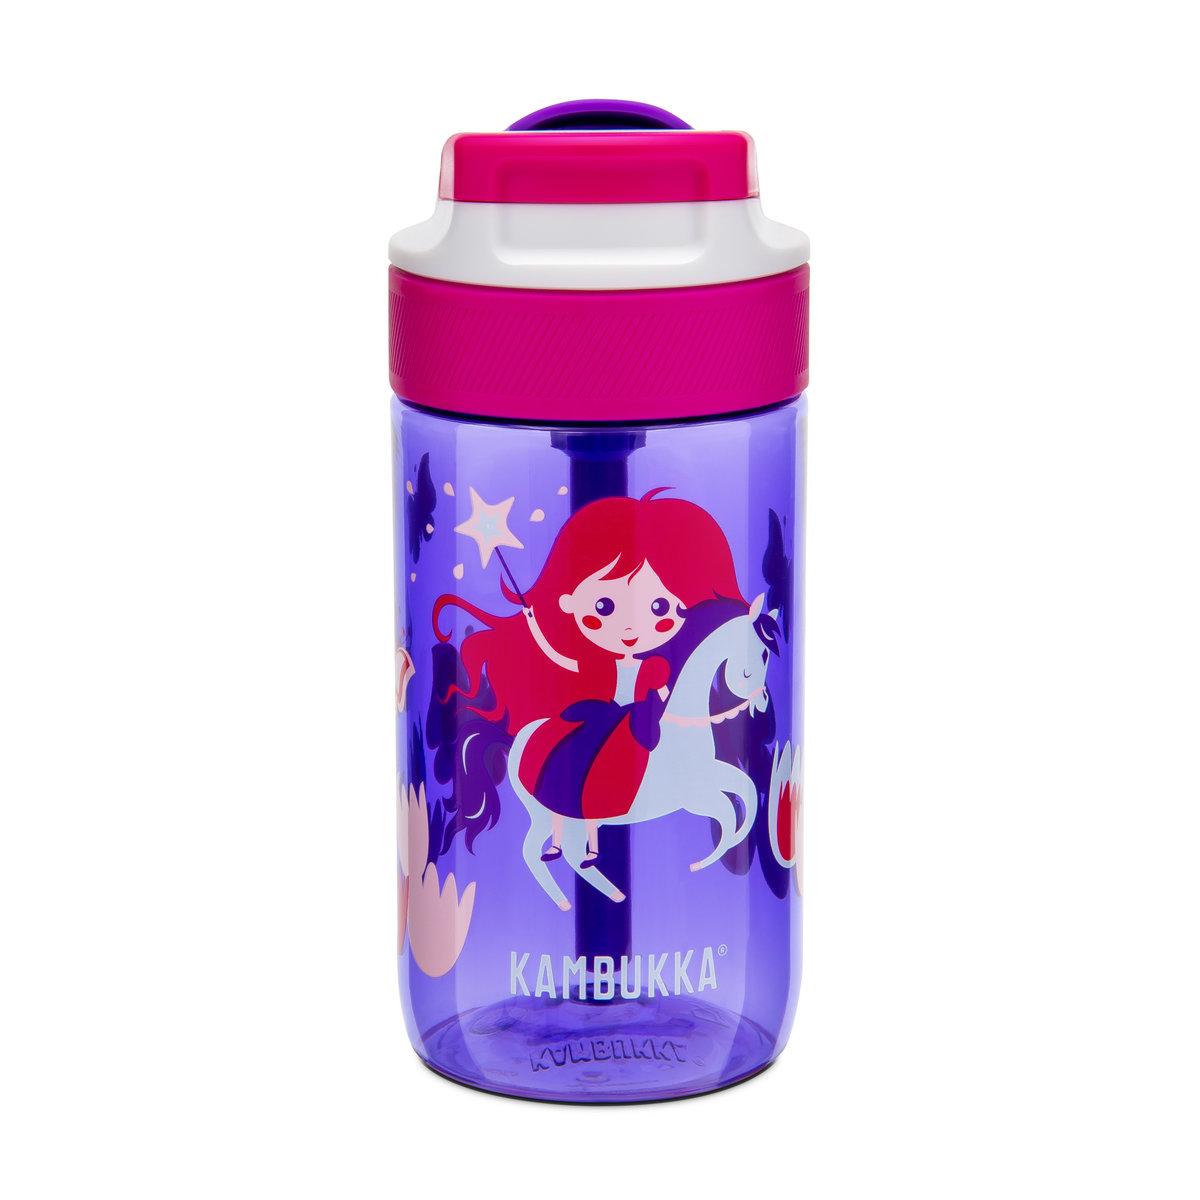 Kambukka 藍湖兒童吸管杯 (Tritan) 14oz (400ml) – 紫羅蘭色+魔術公主圖案